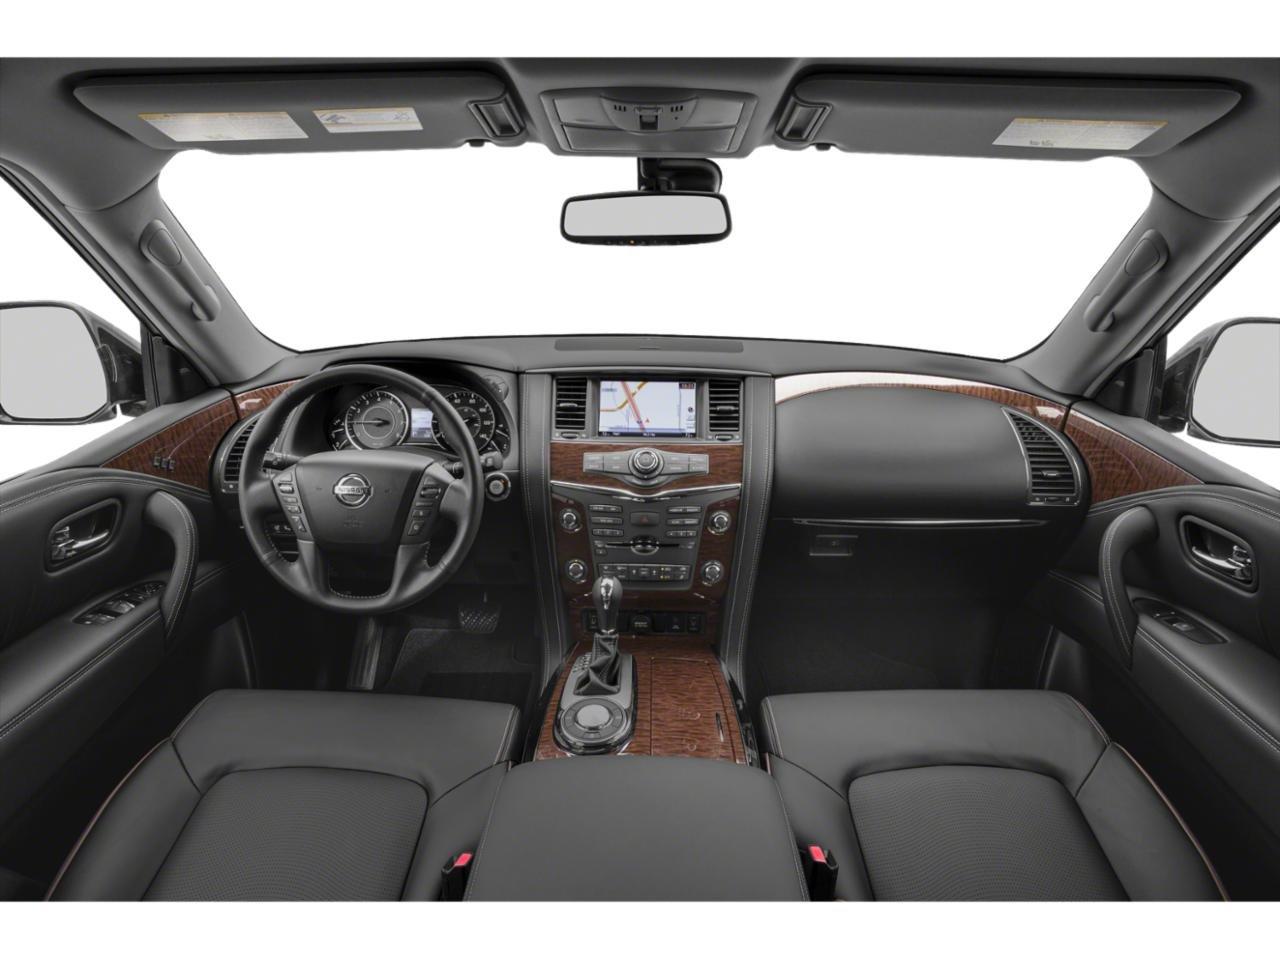 2019 Nissan Armada interior - Taylor's AutoMax Blog